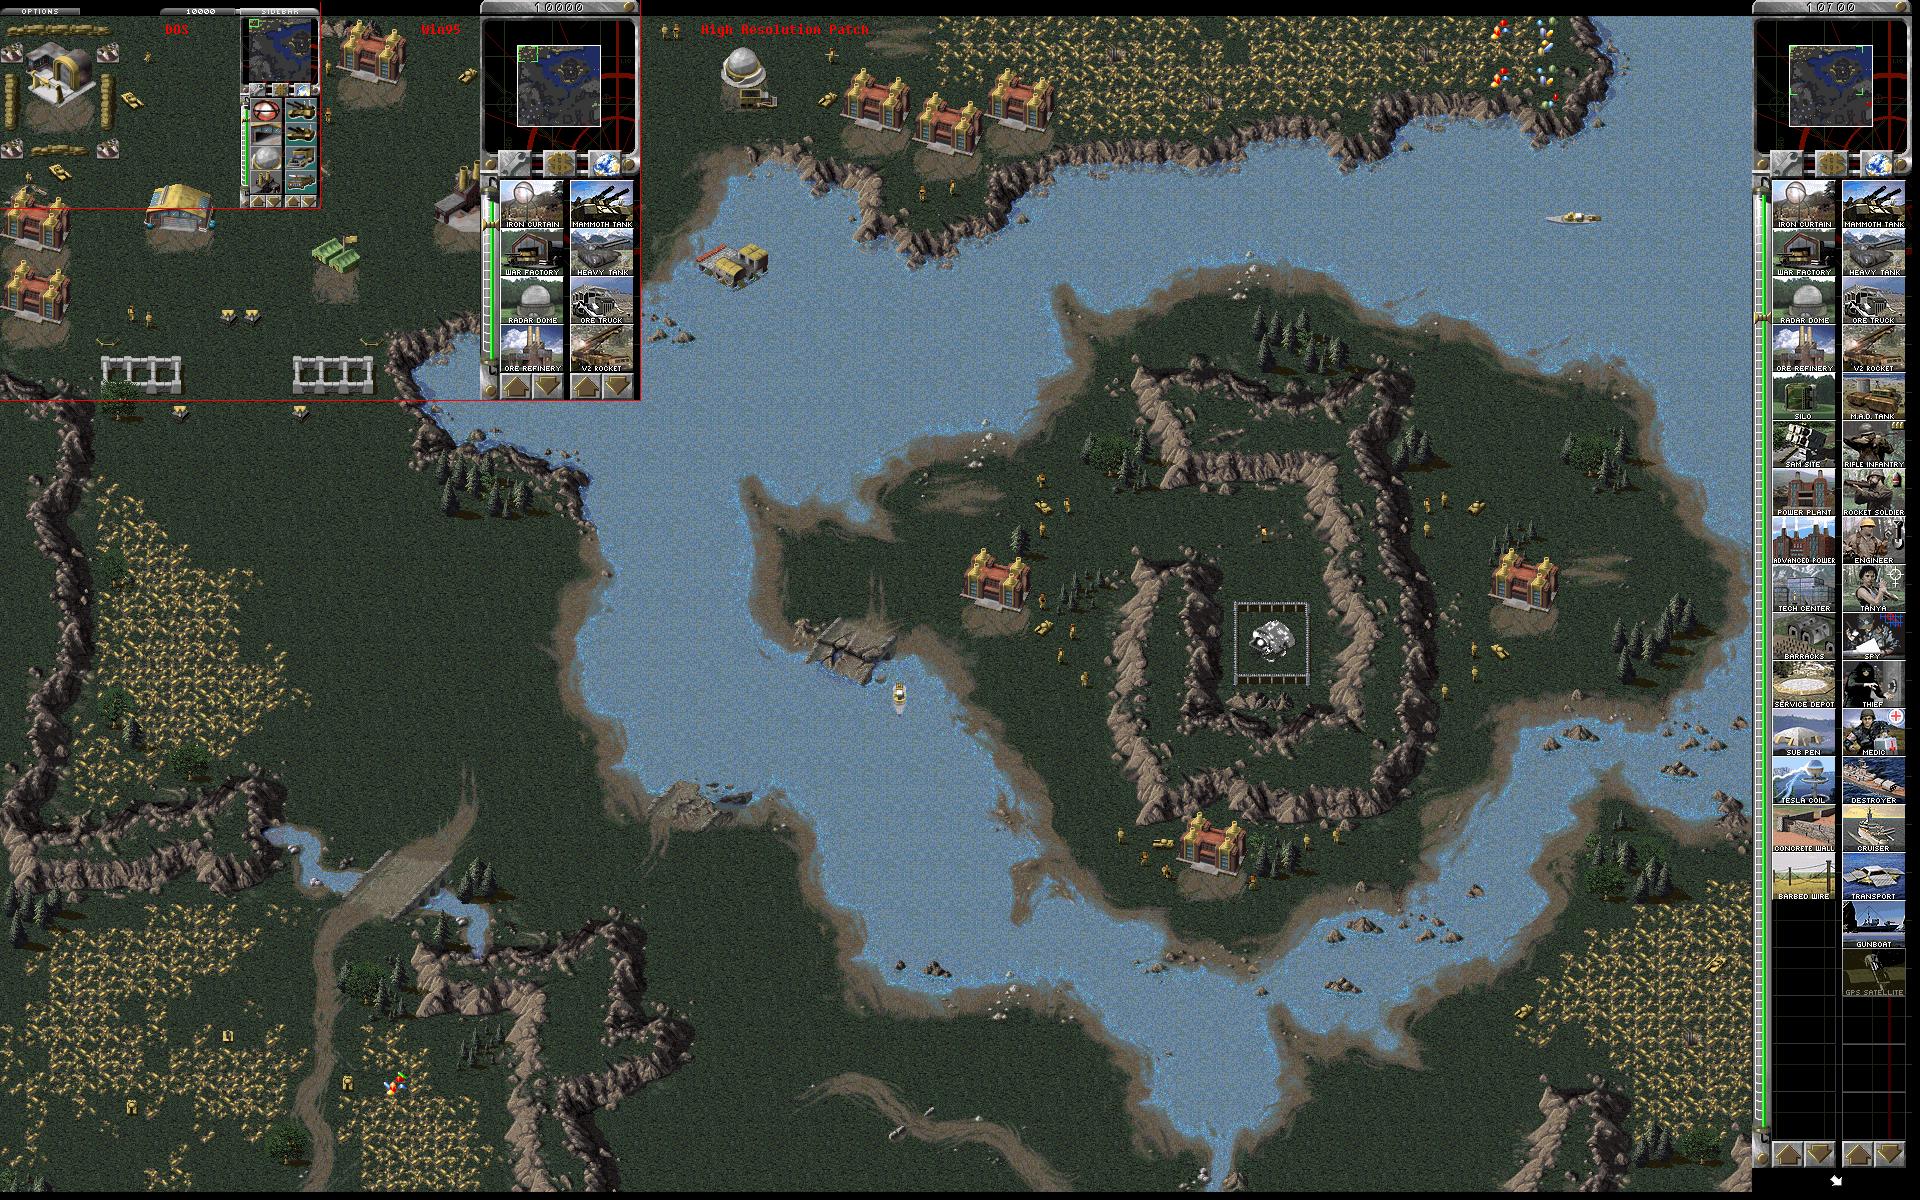 Command Conquer 4 Tiberian Twilight Free Download